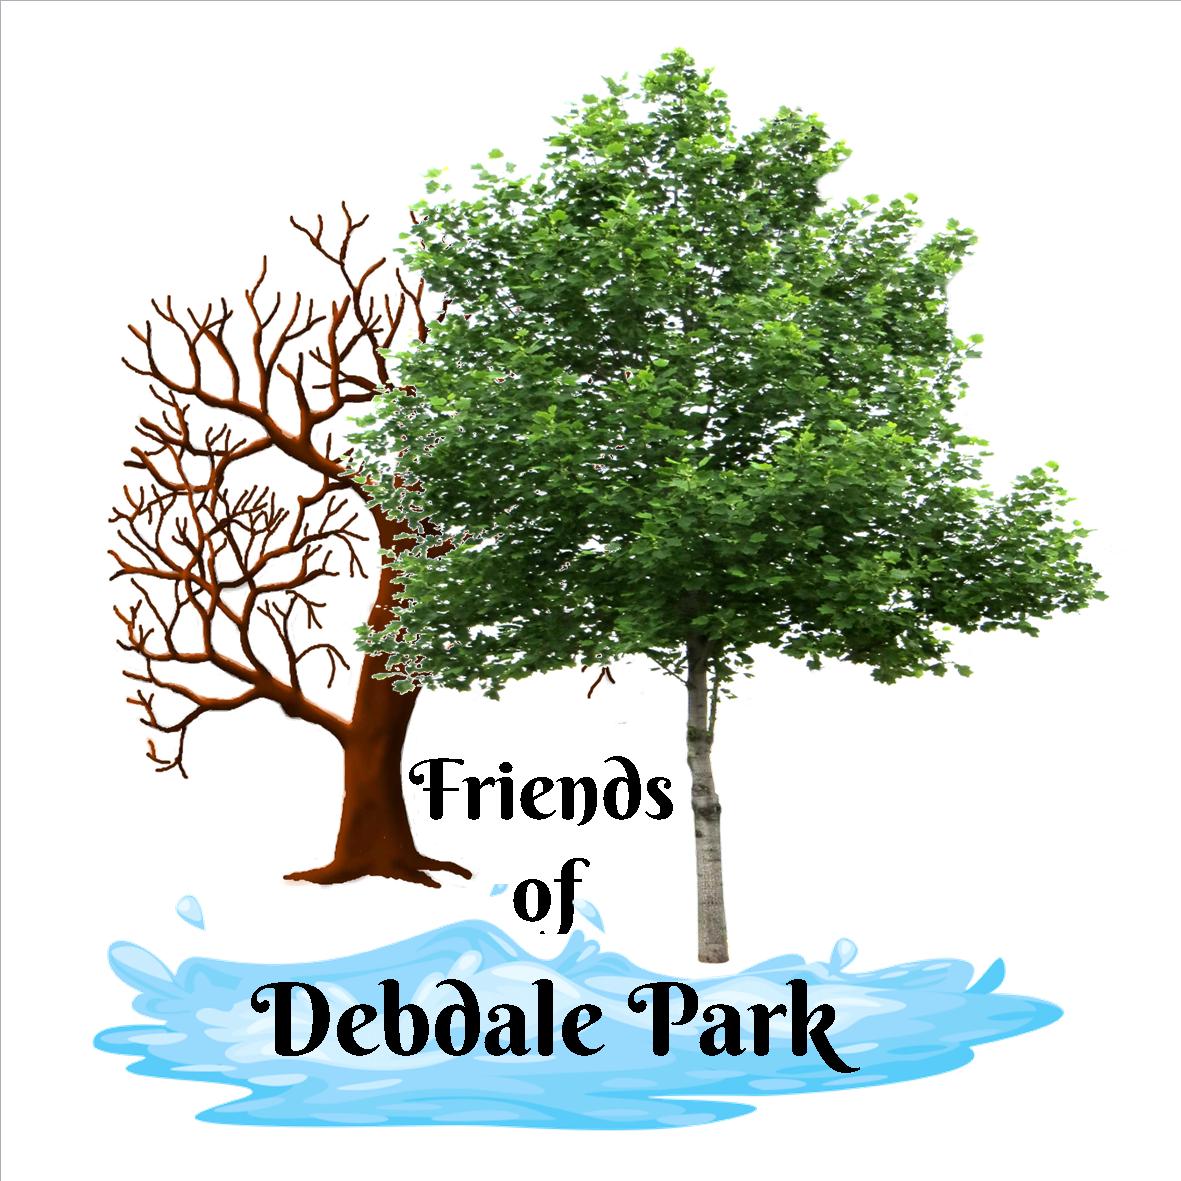 Friends of Debdale Park